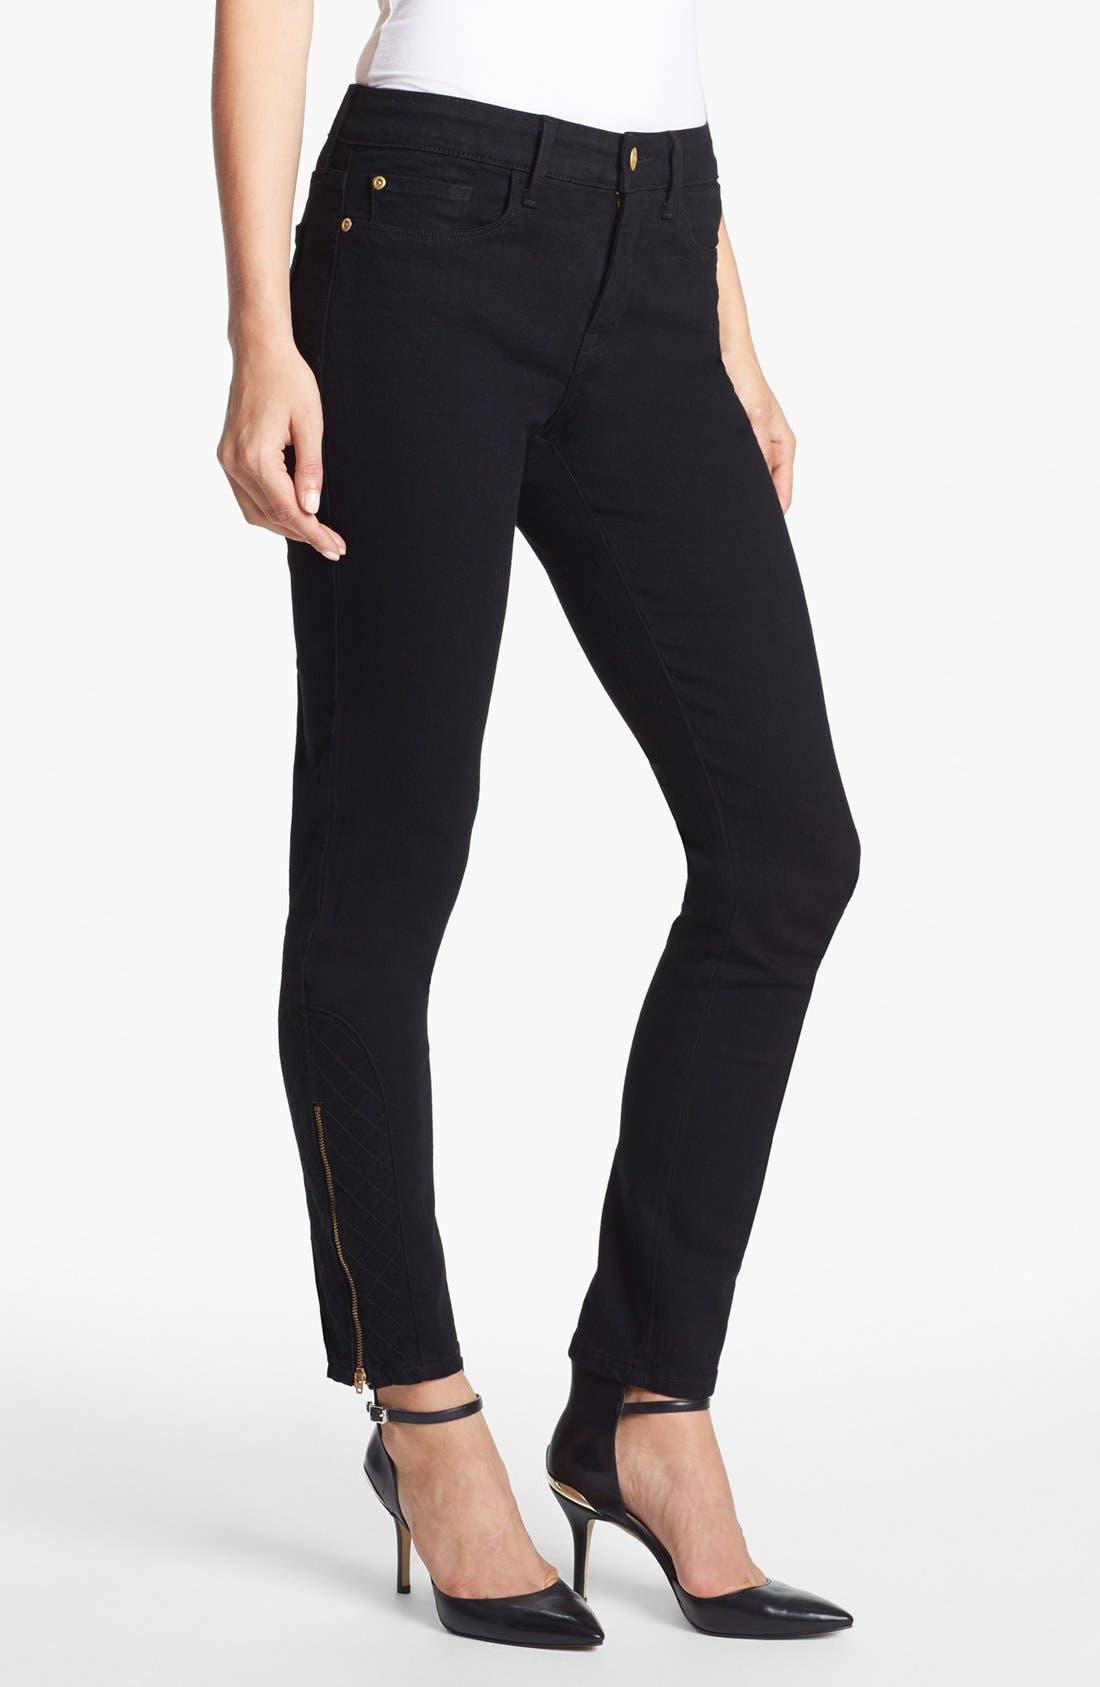 Main Image - NYDJ 'Arabella' Ankle Zip Stretch Skinny Jeans